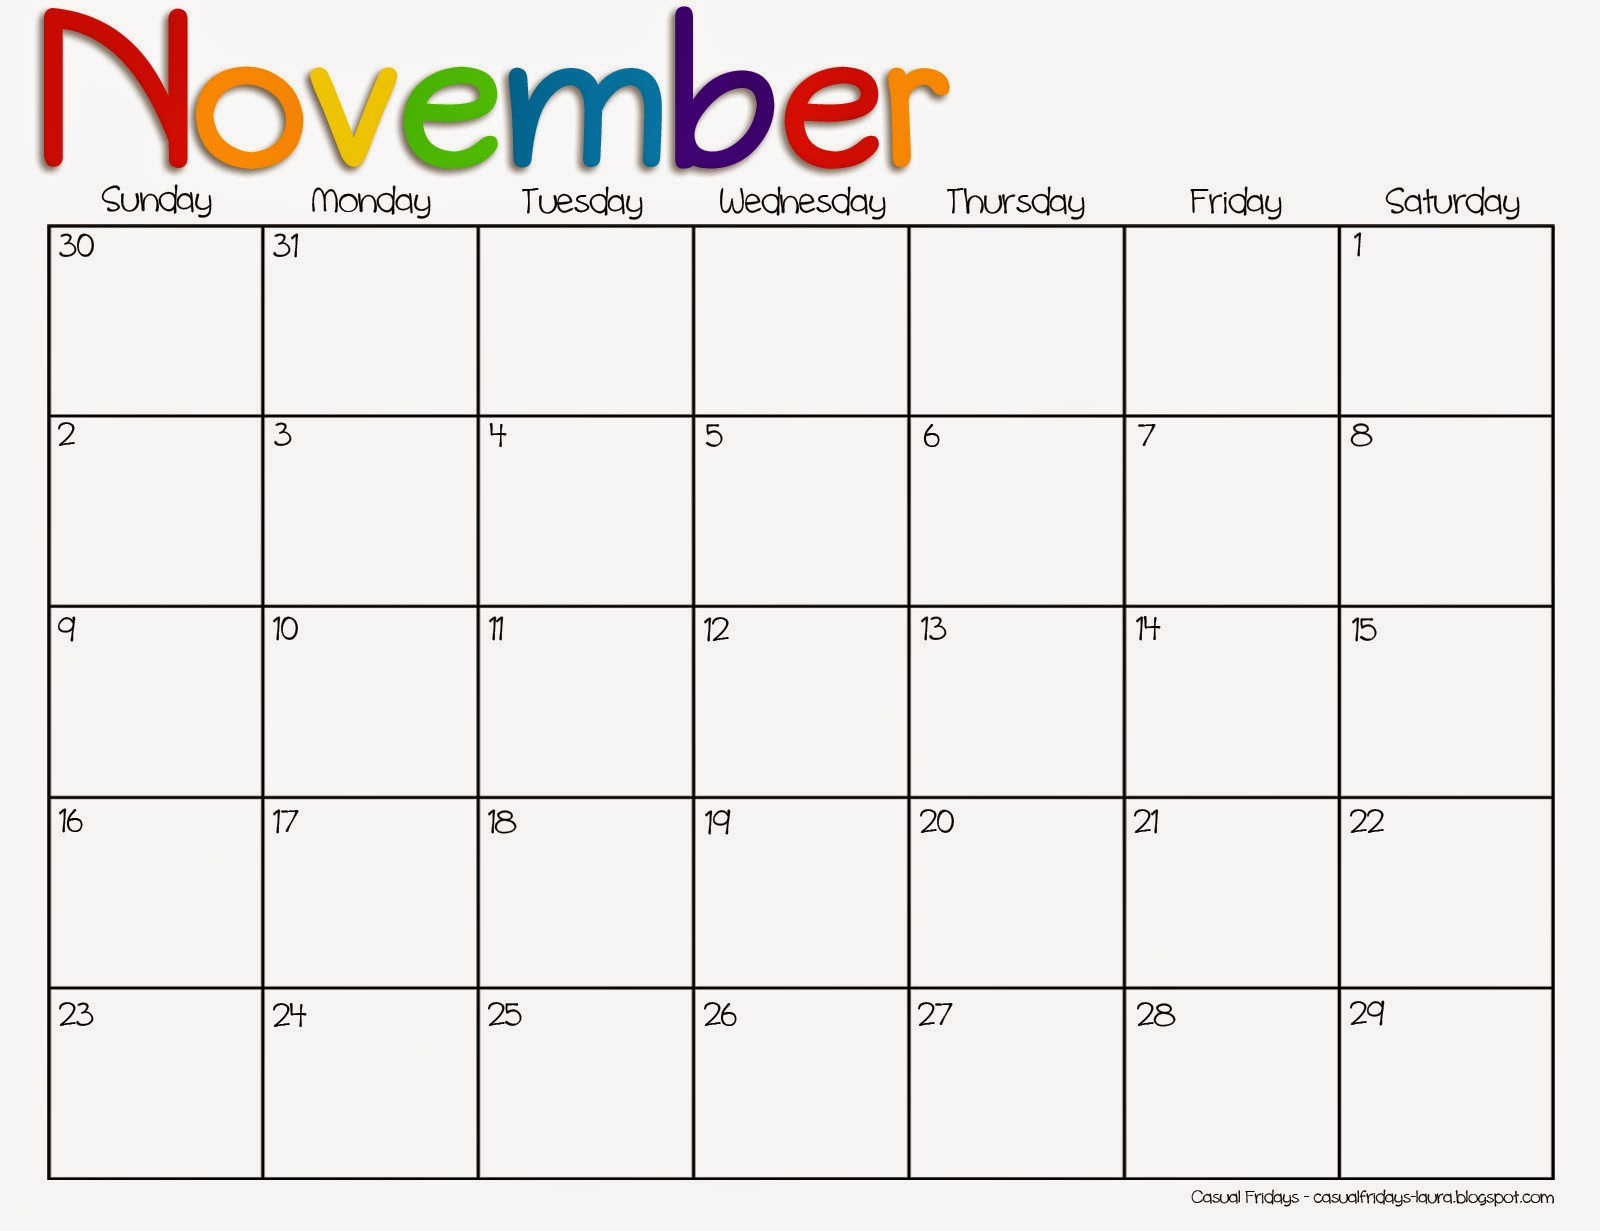 Calendar clipart november 2016. Preschool clipartfest